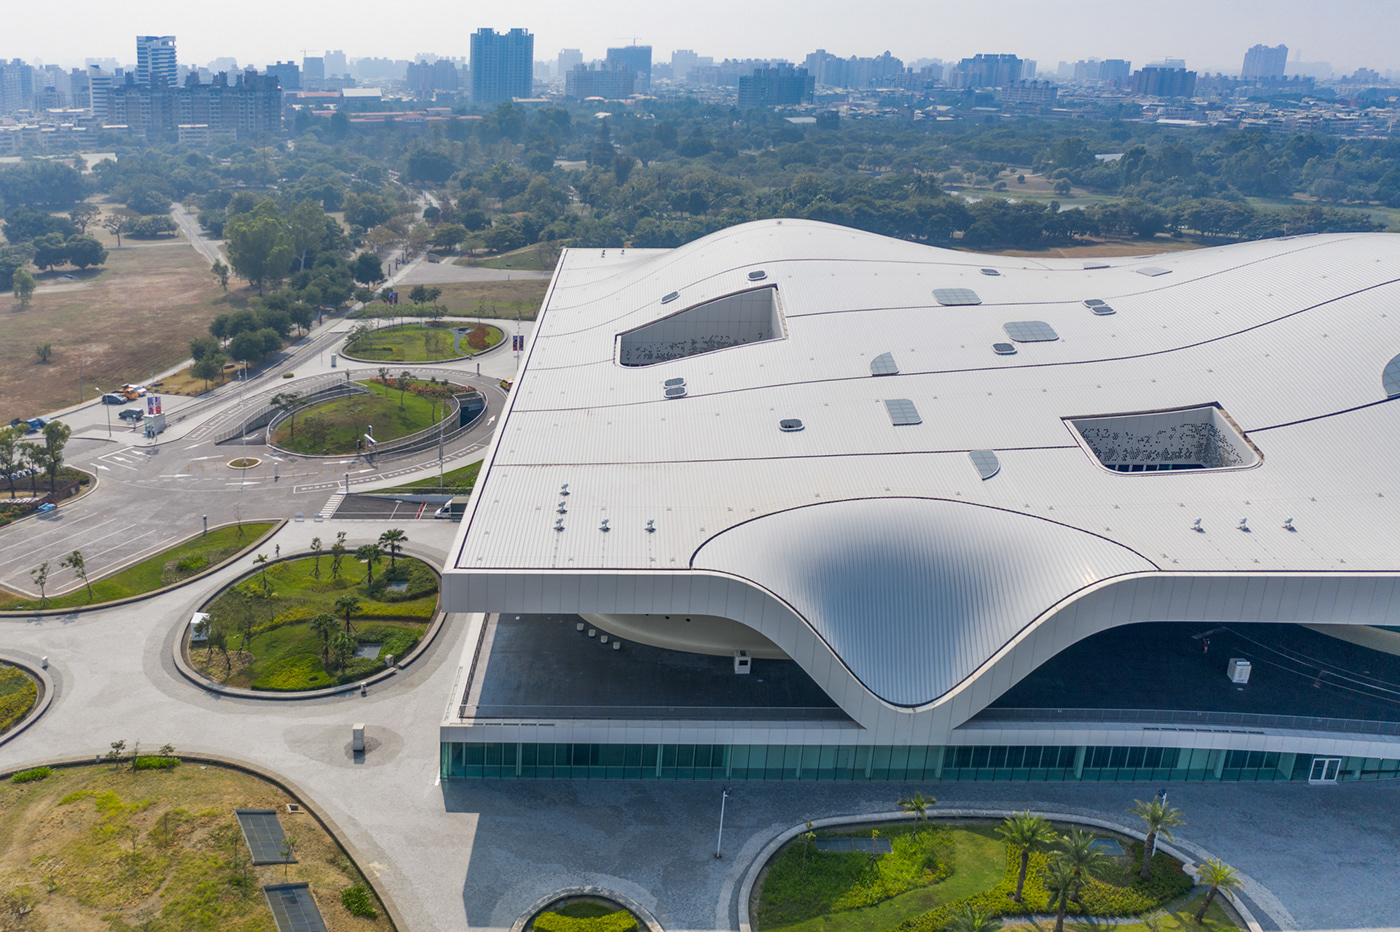 architecture Architecture Photography Francine Houben Kaohsiung kaohsiungcentreofarts KRIS PROVOOST kris provoost photography Mecanoo taiwan